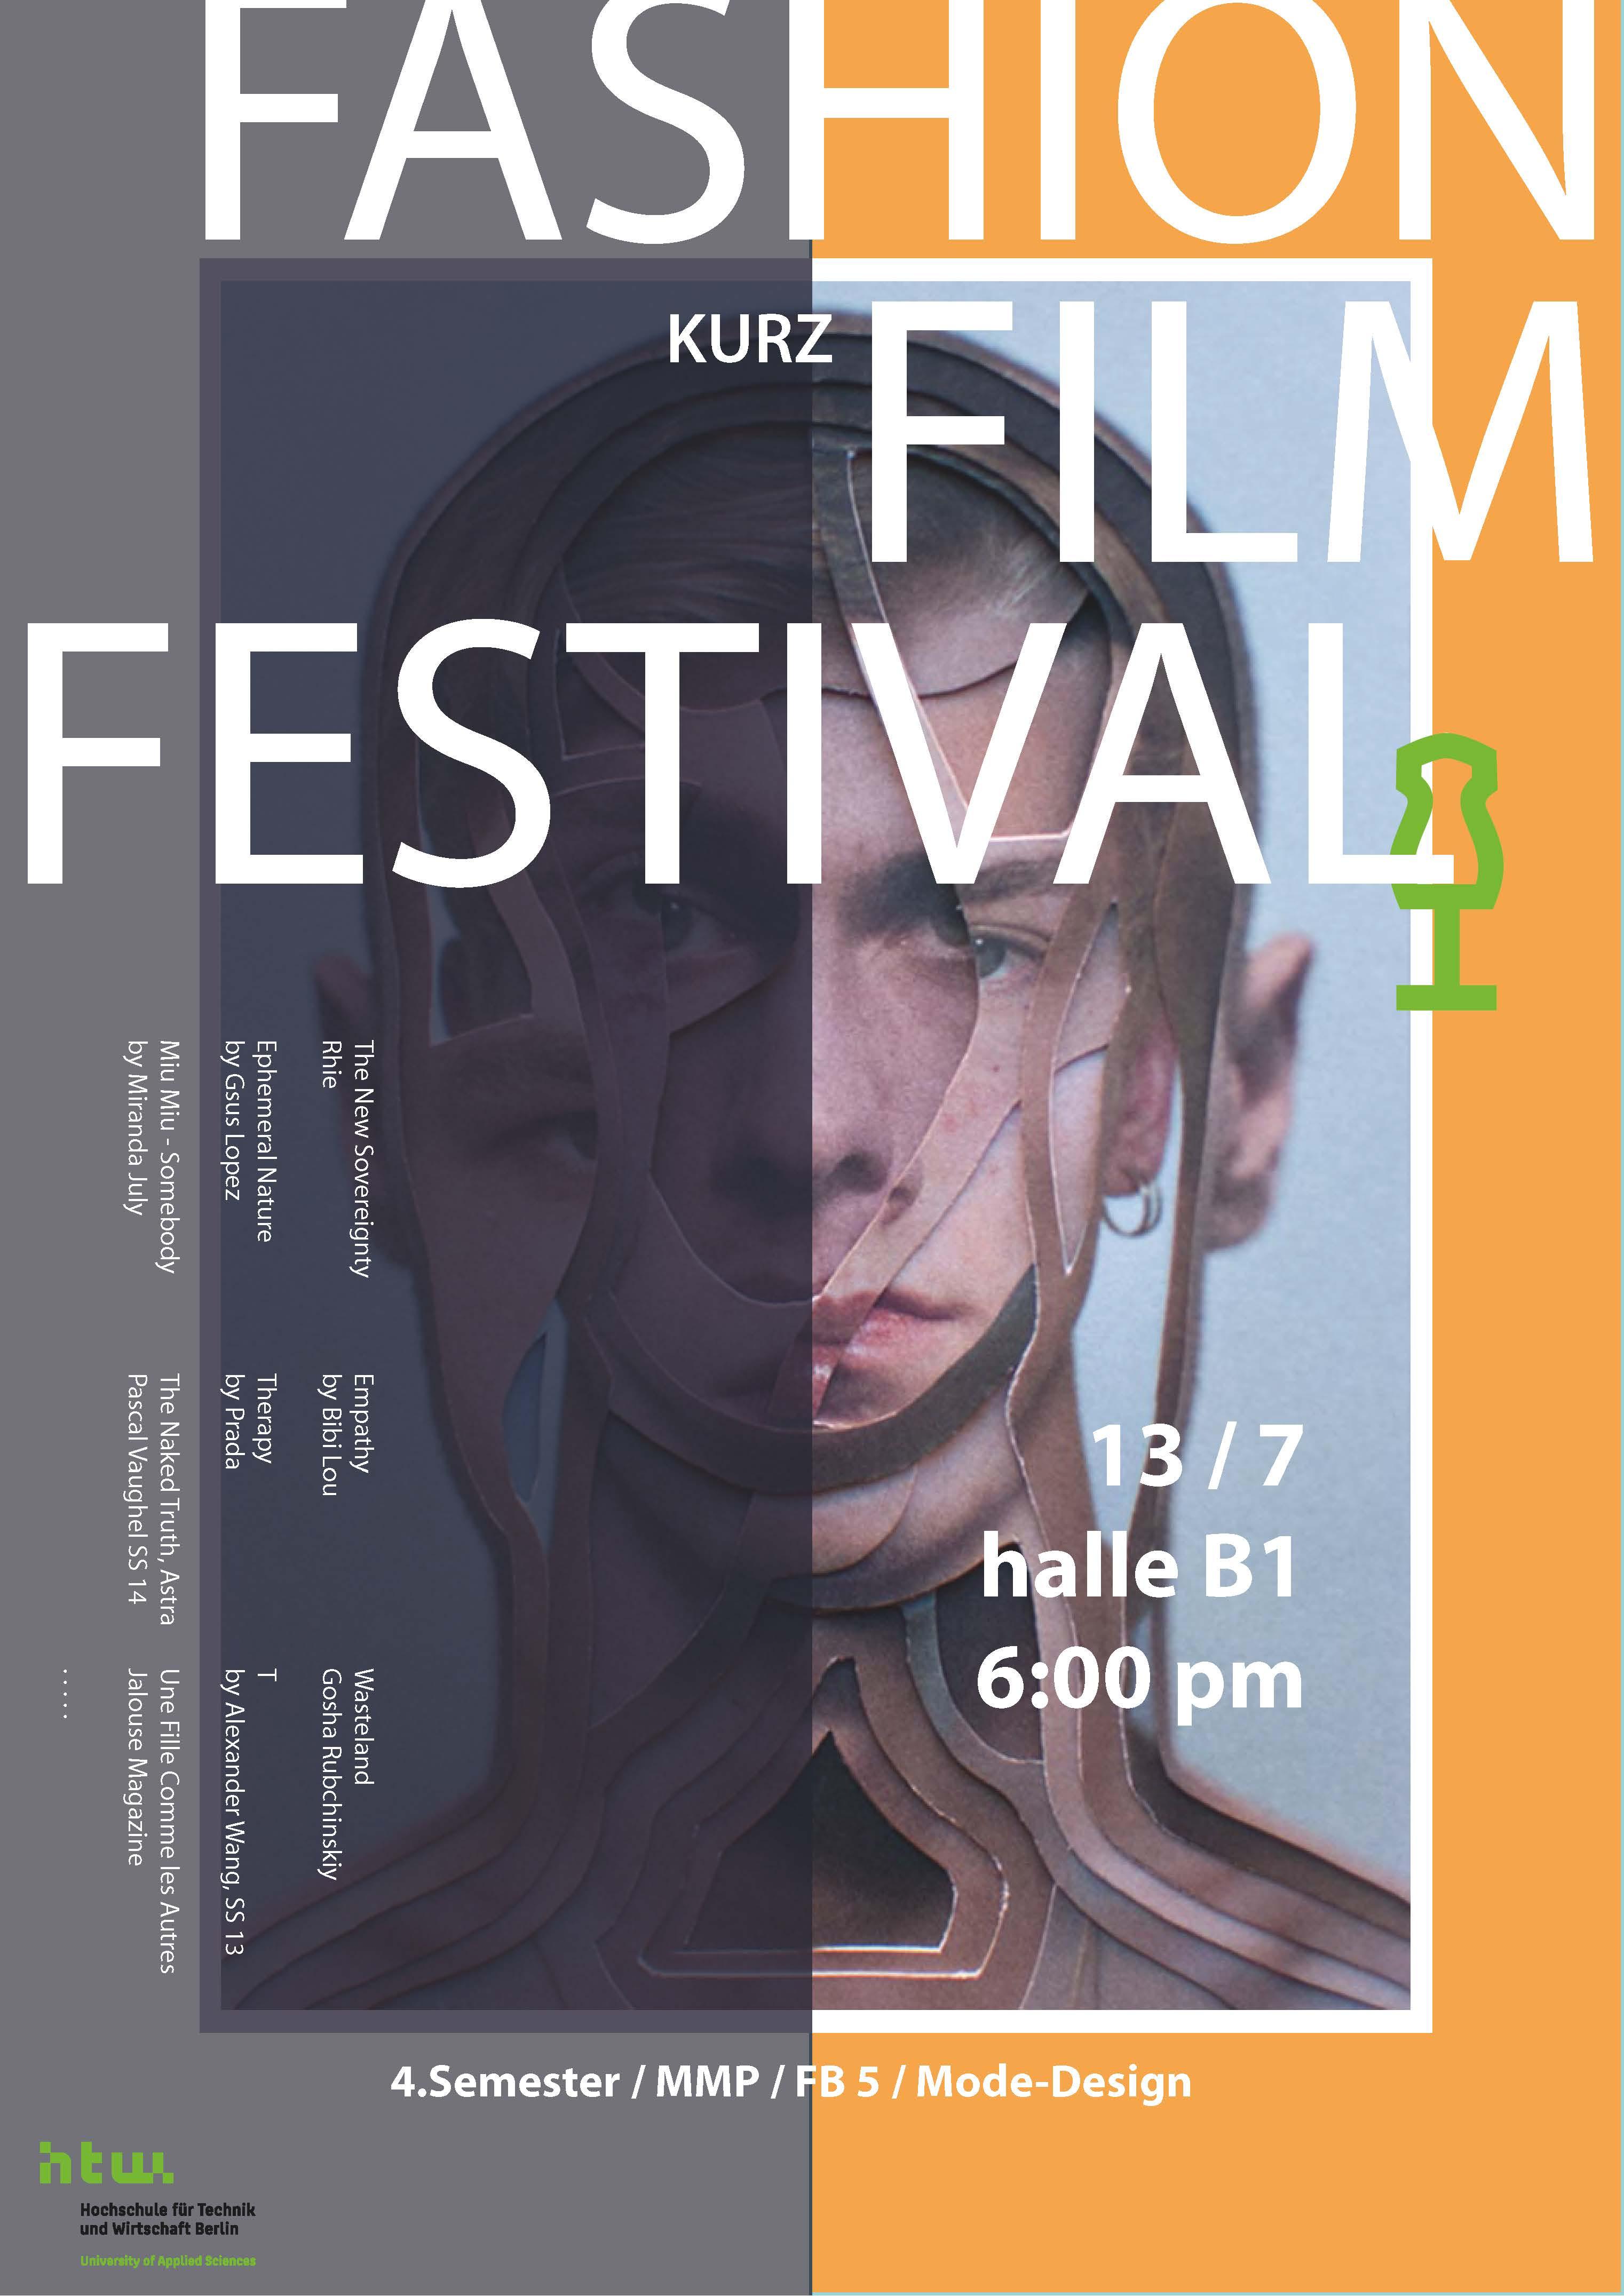 Fashion Kurz Film Festival